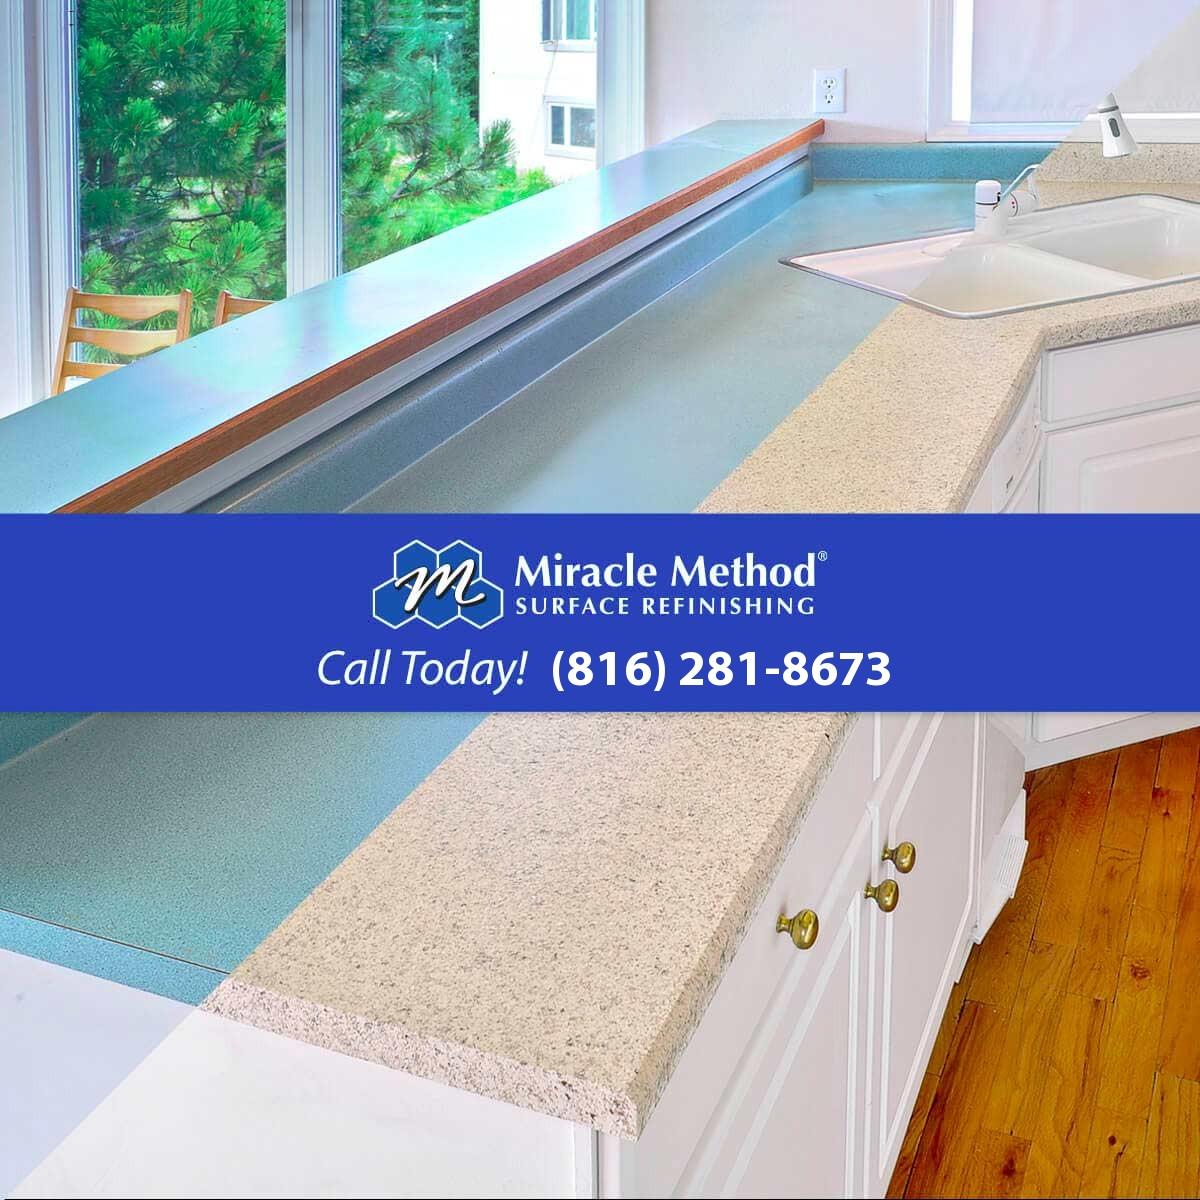 Kansas City  MO Surface Refinishing   Repair   Miracle Method of Kansas City  SE. Kansas City  MO Surface Refinishing   Repair   Miracle Method of